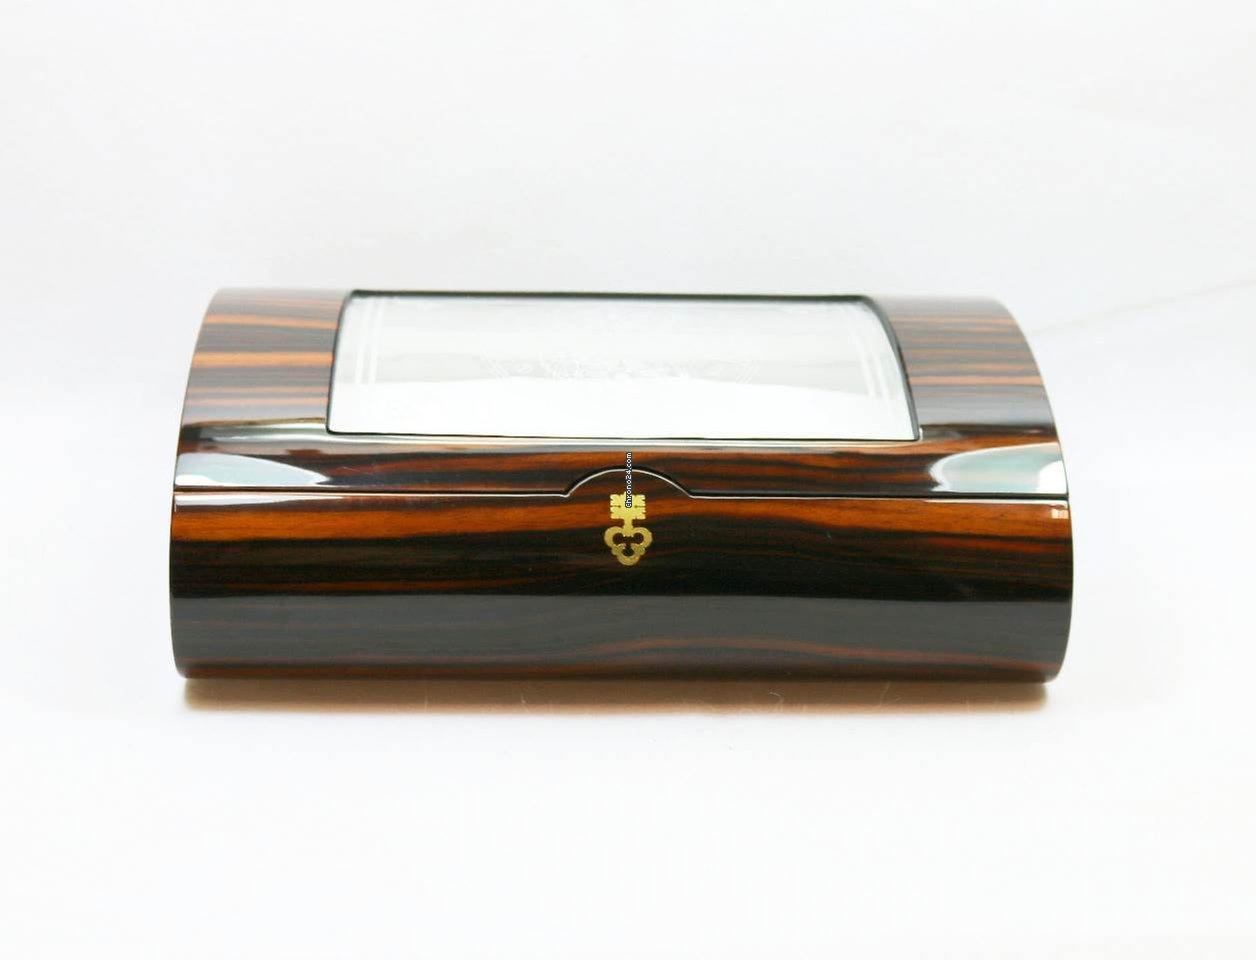 corum luxus edelholz uhren box verziertes echtglas. Black Bedroom Furniture Sets. Home Design Ideas